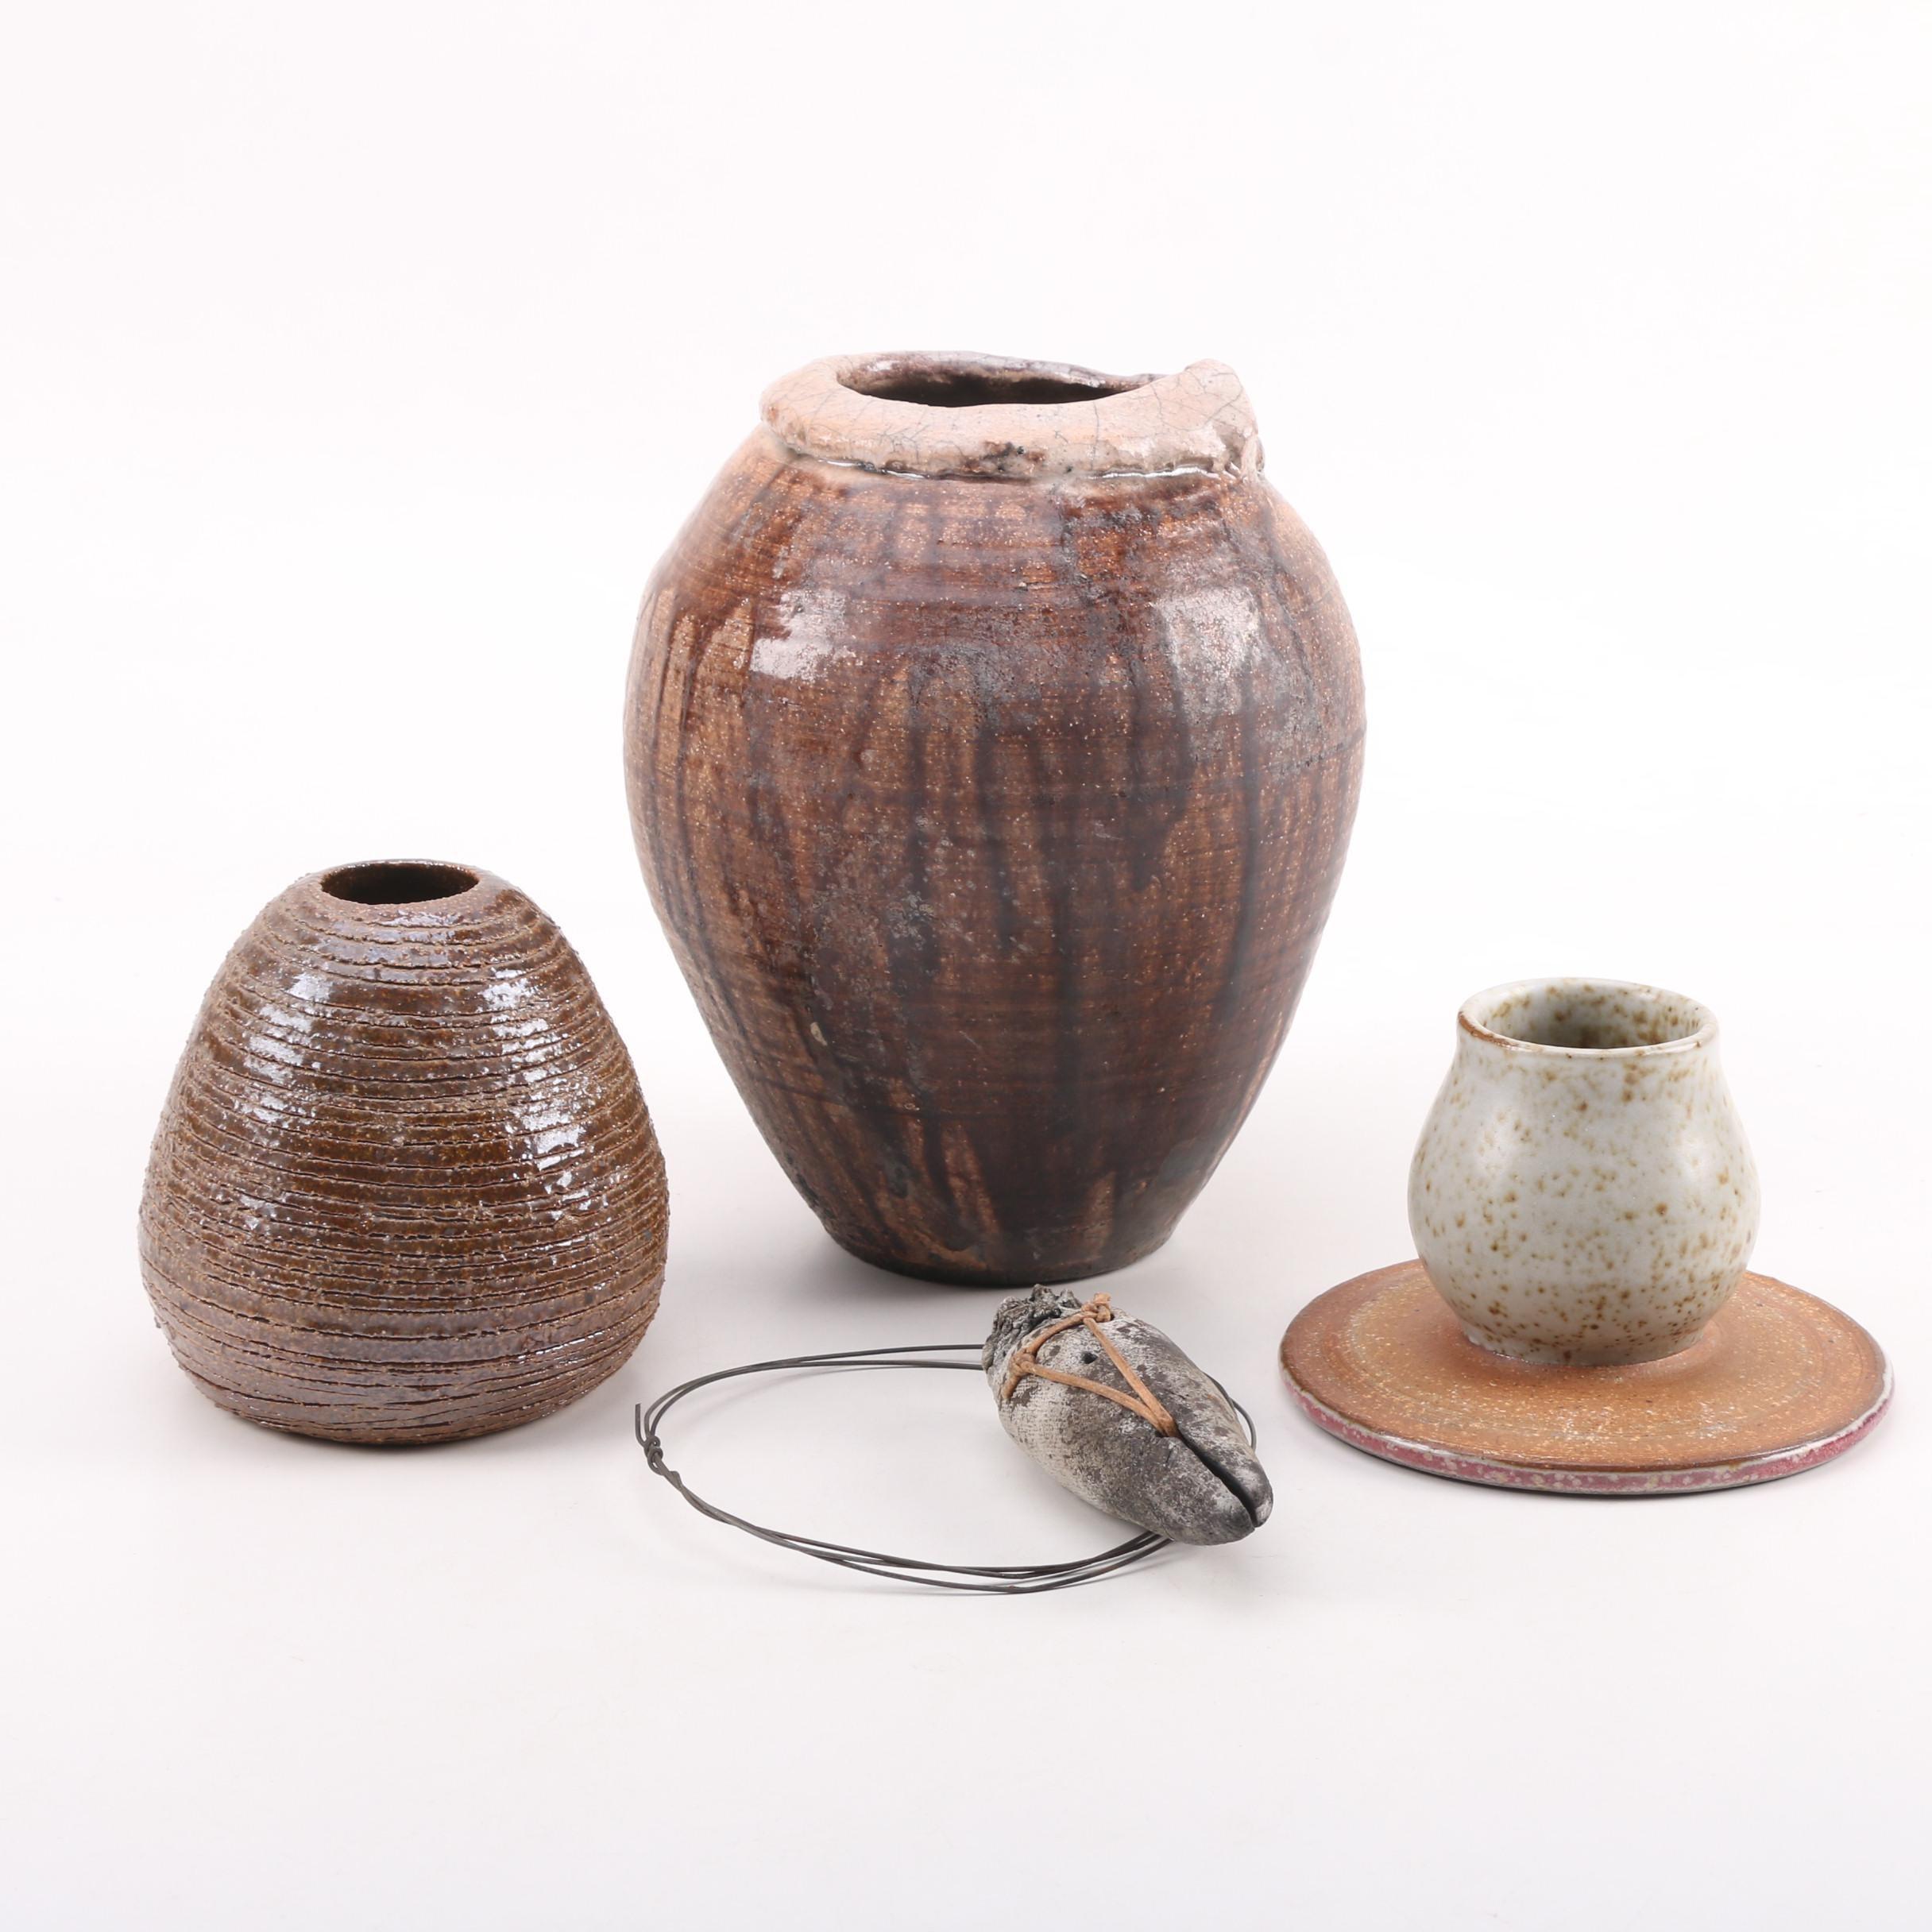 Wheel Thrown Stoneware Vases and Bird Figurine